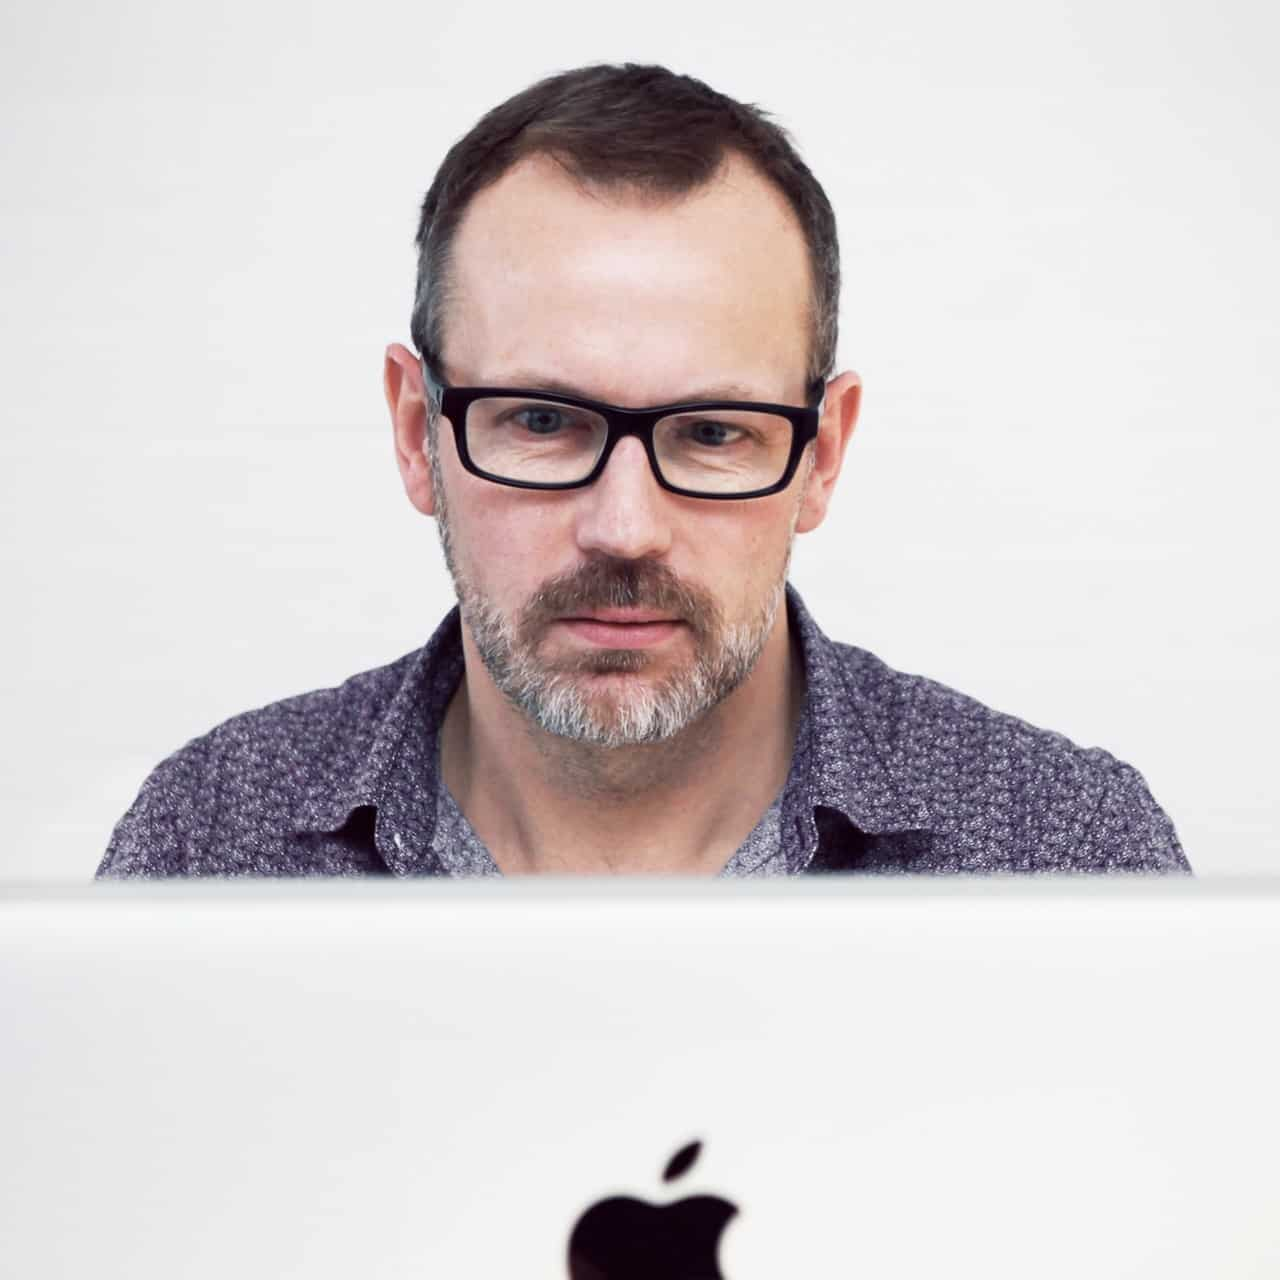 Patrick Foster headshot.jpg